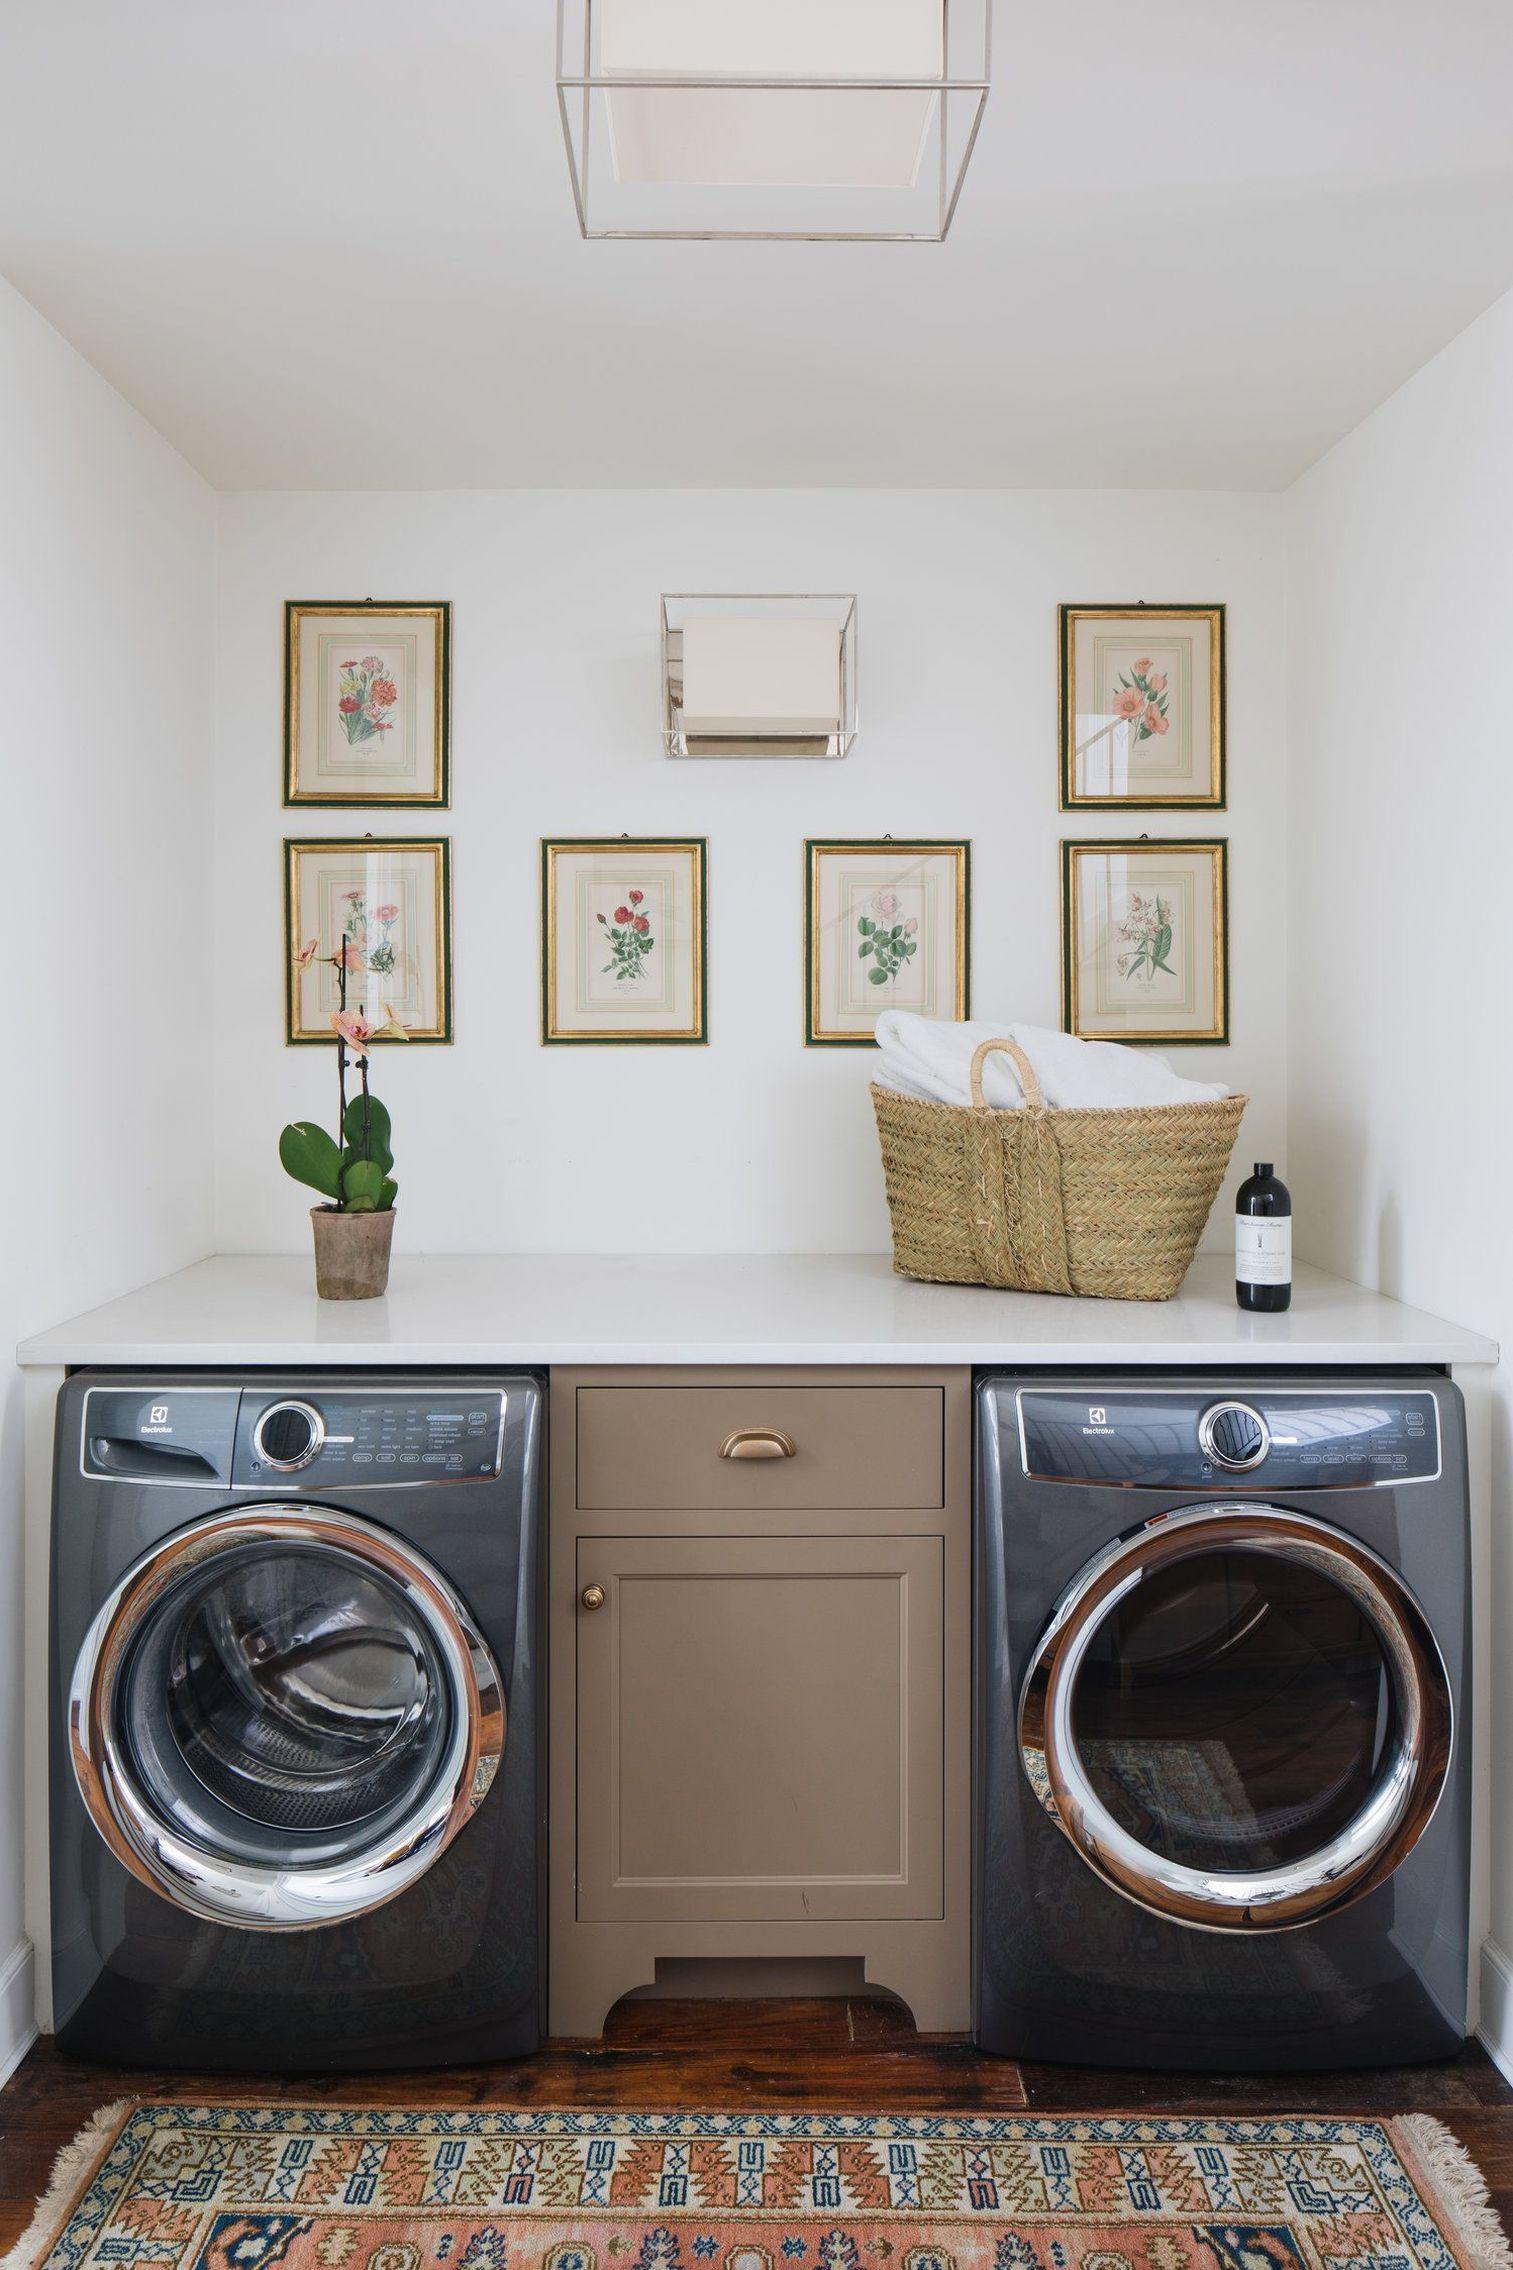 10x10 Laundry Room Layout: 10 Best Laundry Room Love Ideas